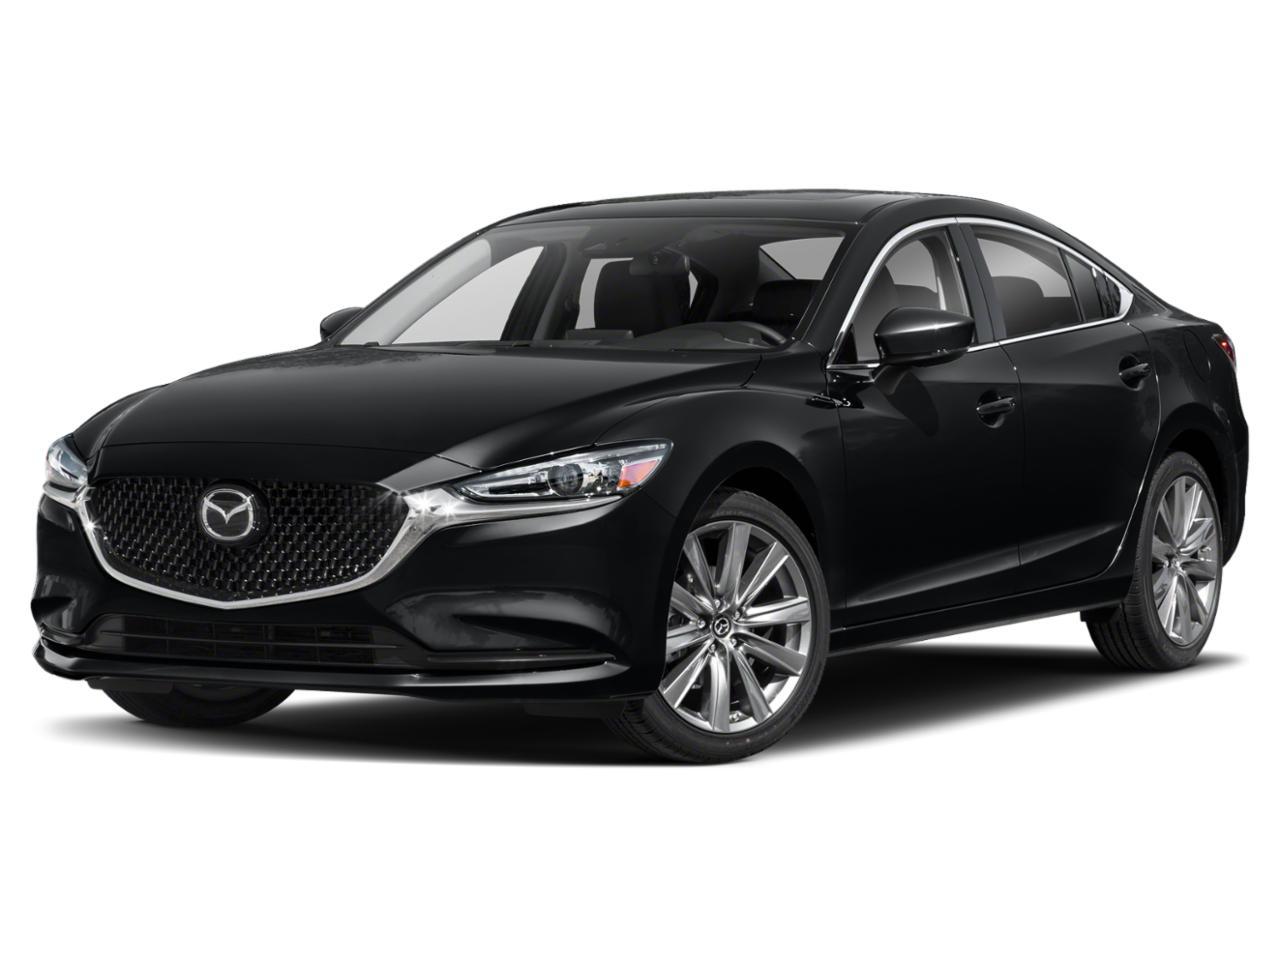 2019 Mazda Mazda6 Vehicle Photo in Raton, NM 87740